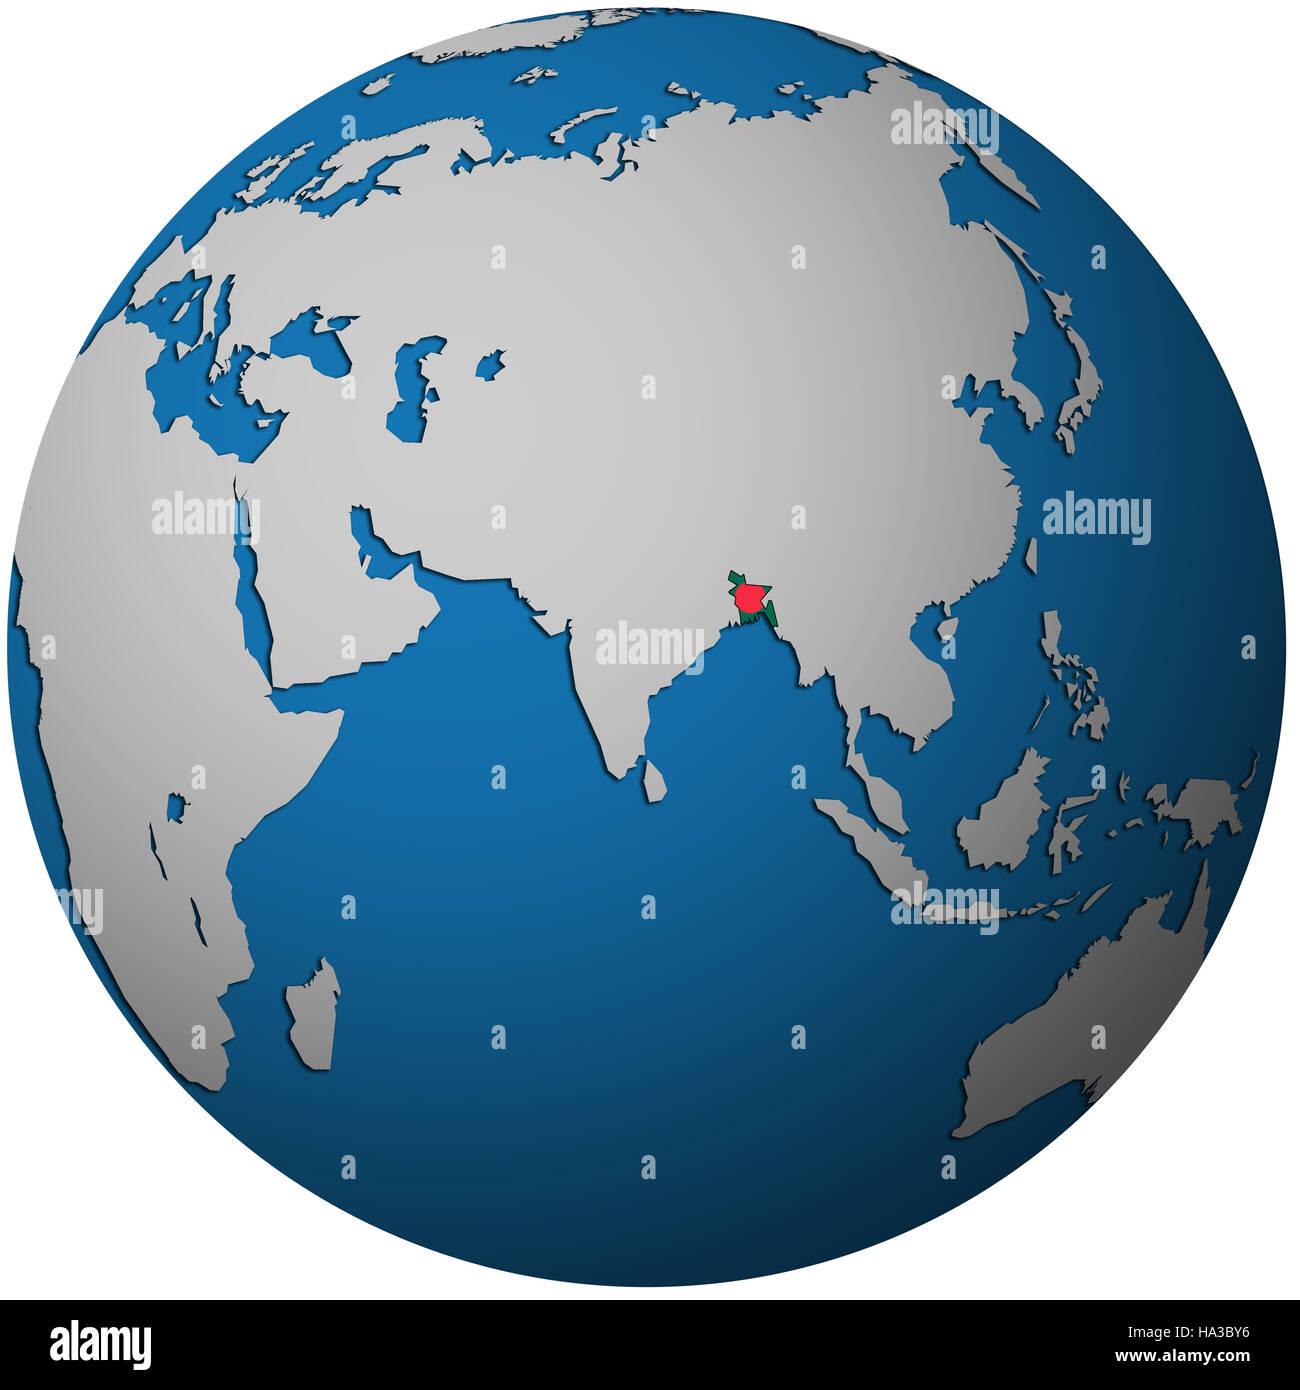 Isolated over white territory of bangladesh with flag on globe map isolated over white territory of bangladesh with flag on globe map gumiabroncs Choice Image